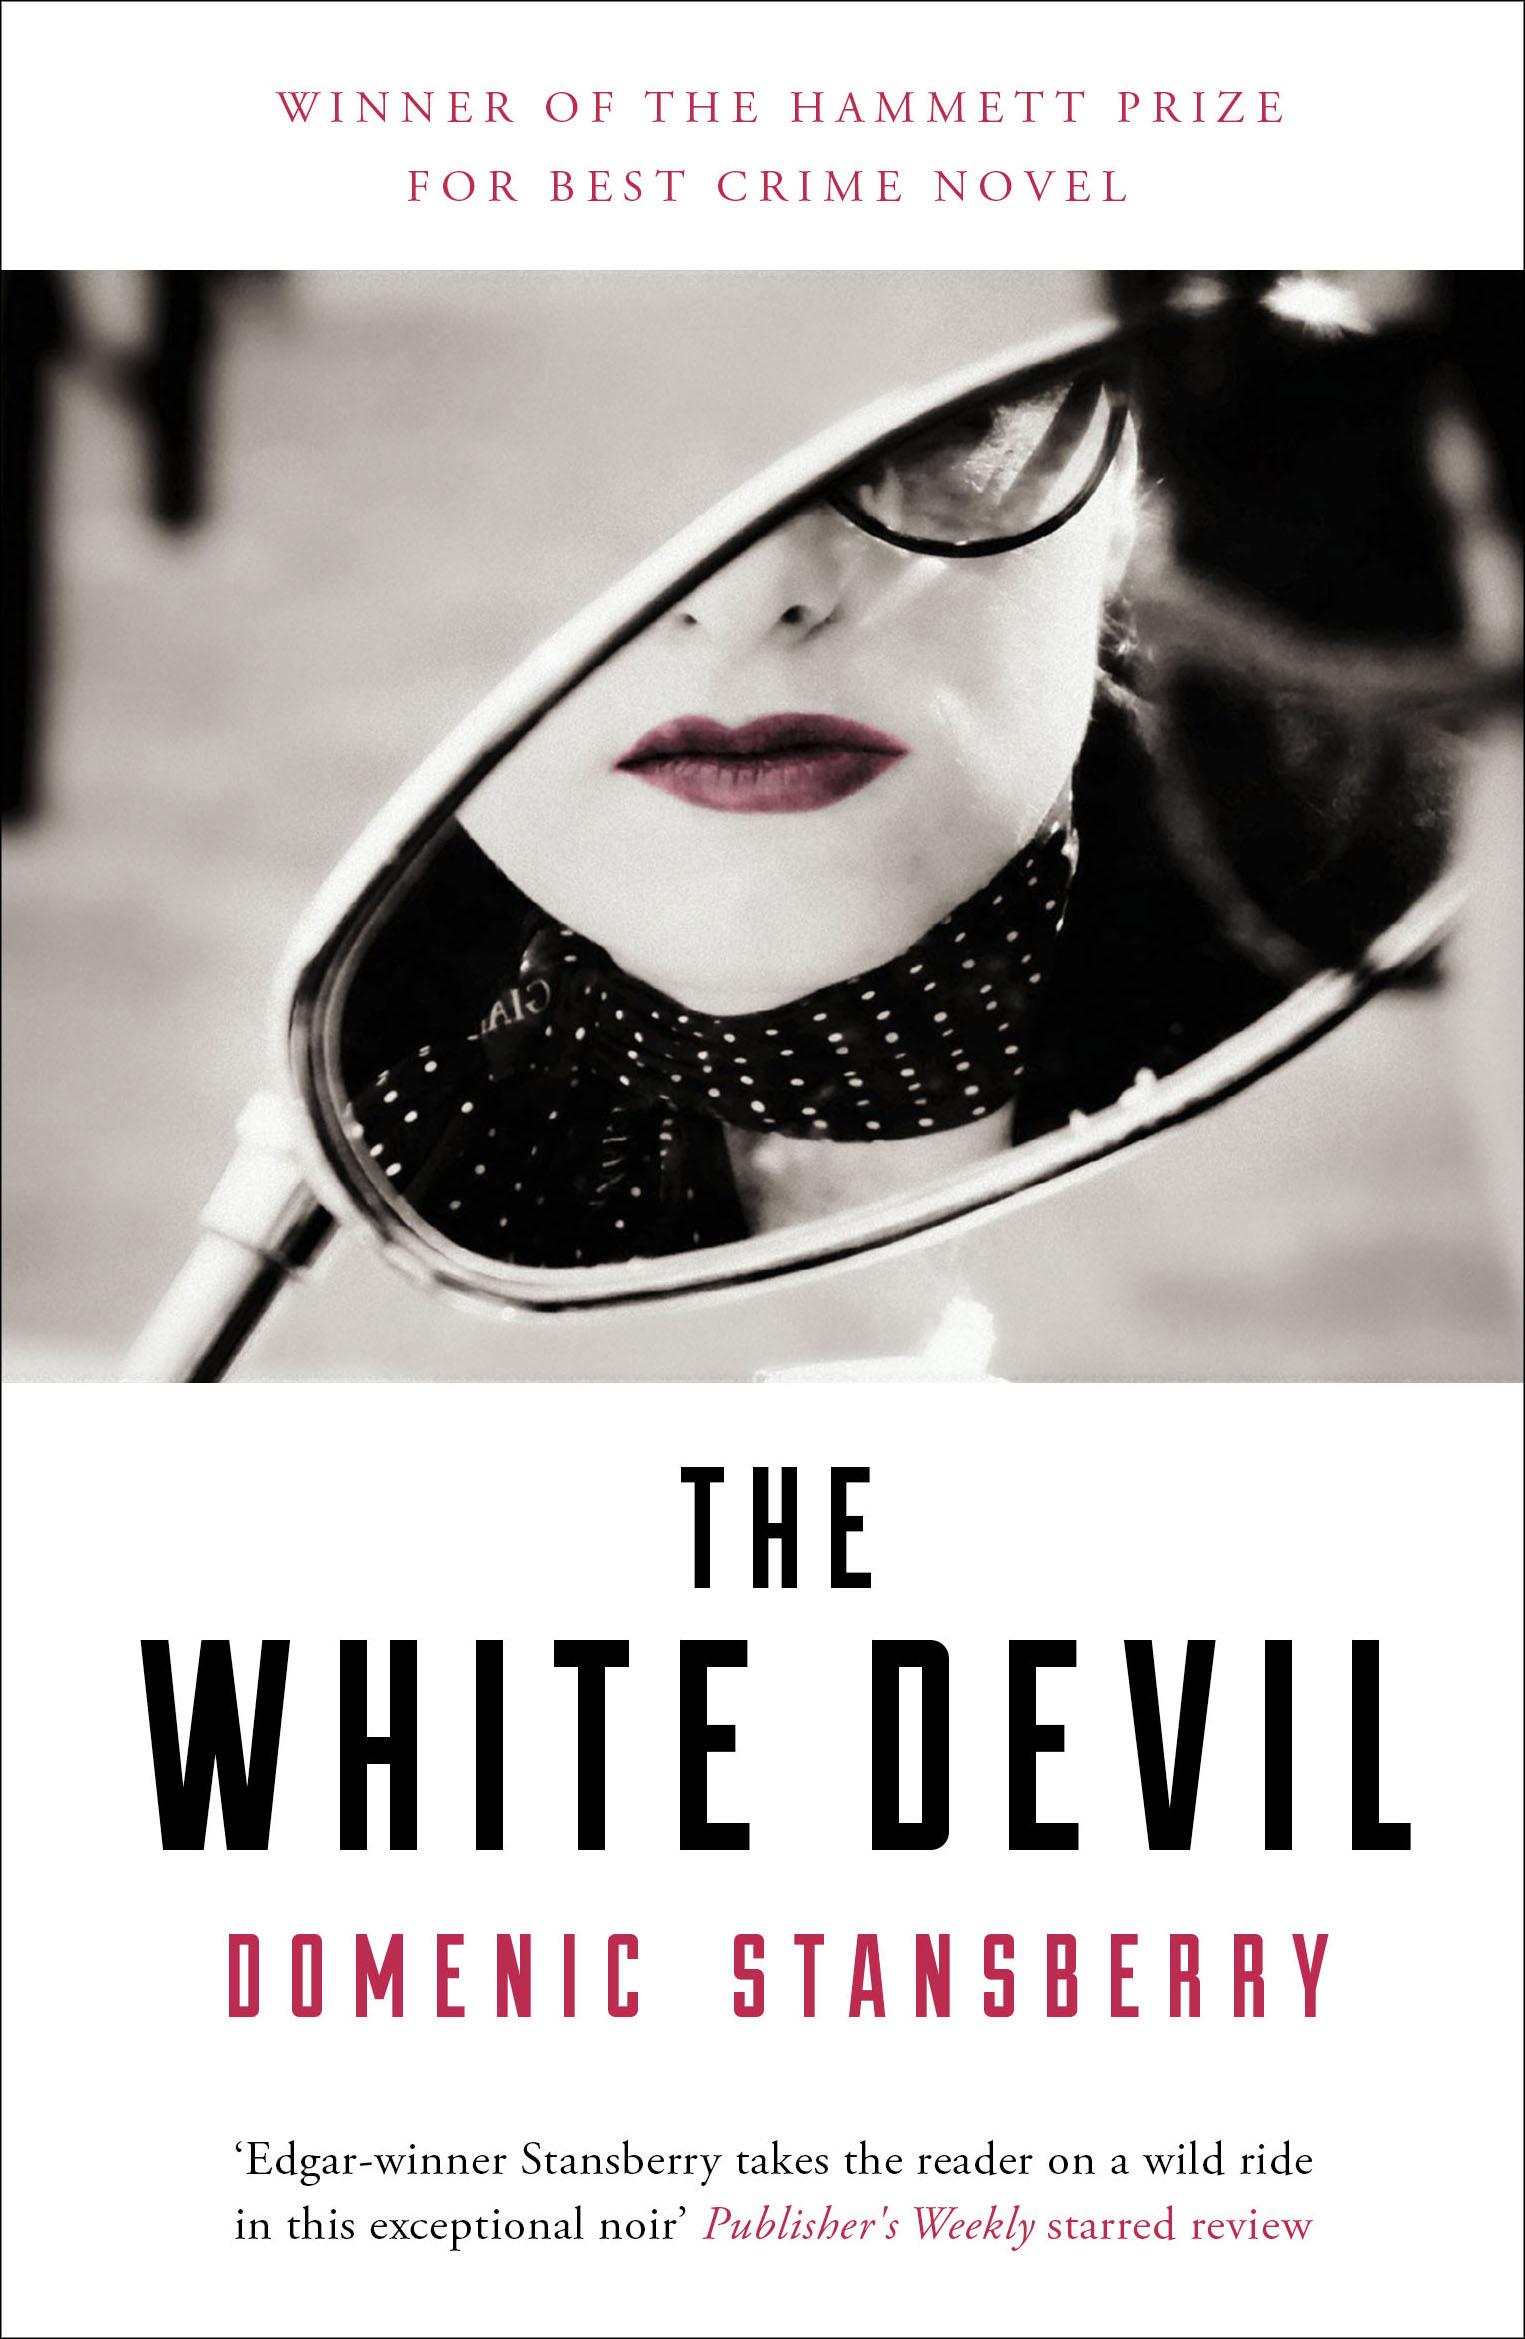 THE WHITE DEVIL - UK jacket design